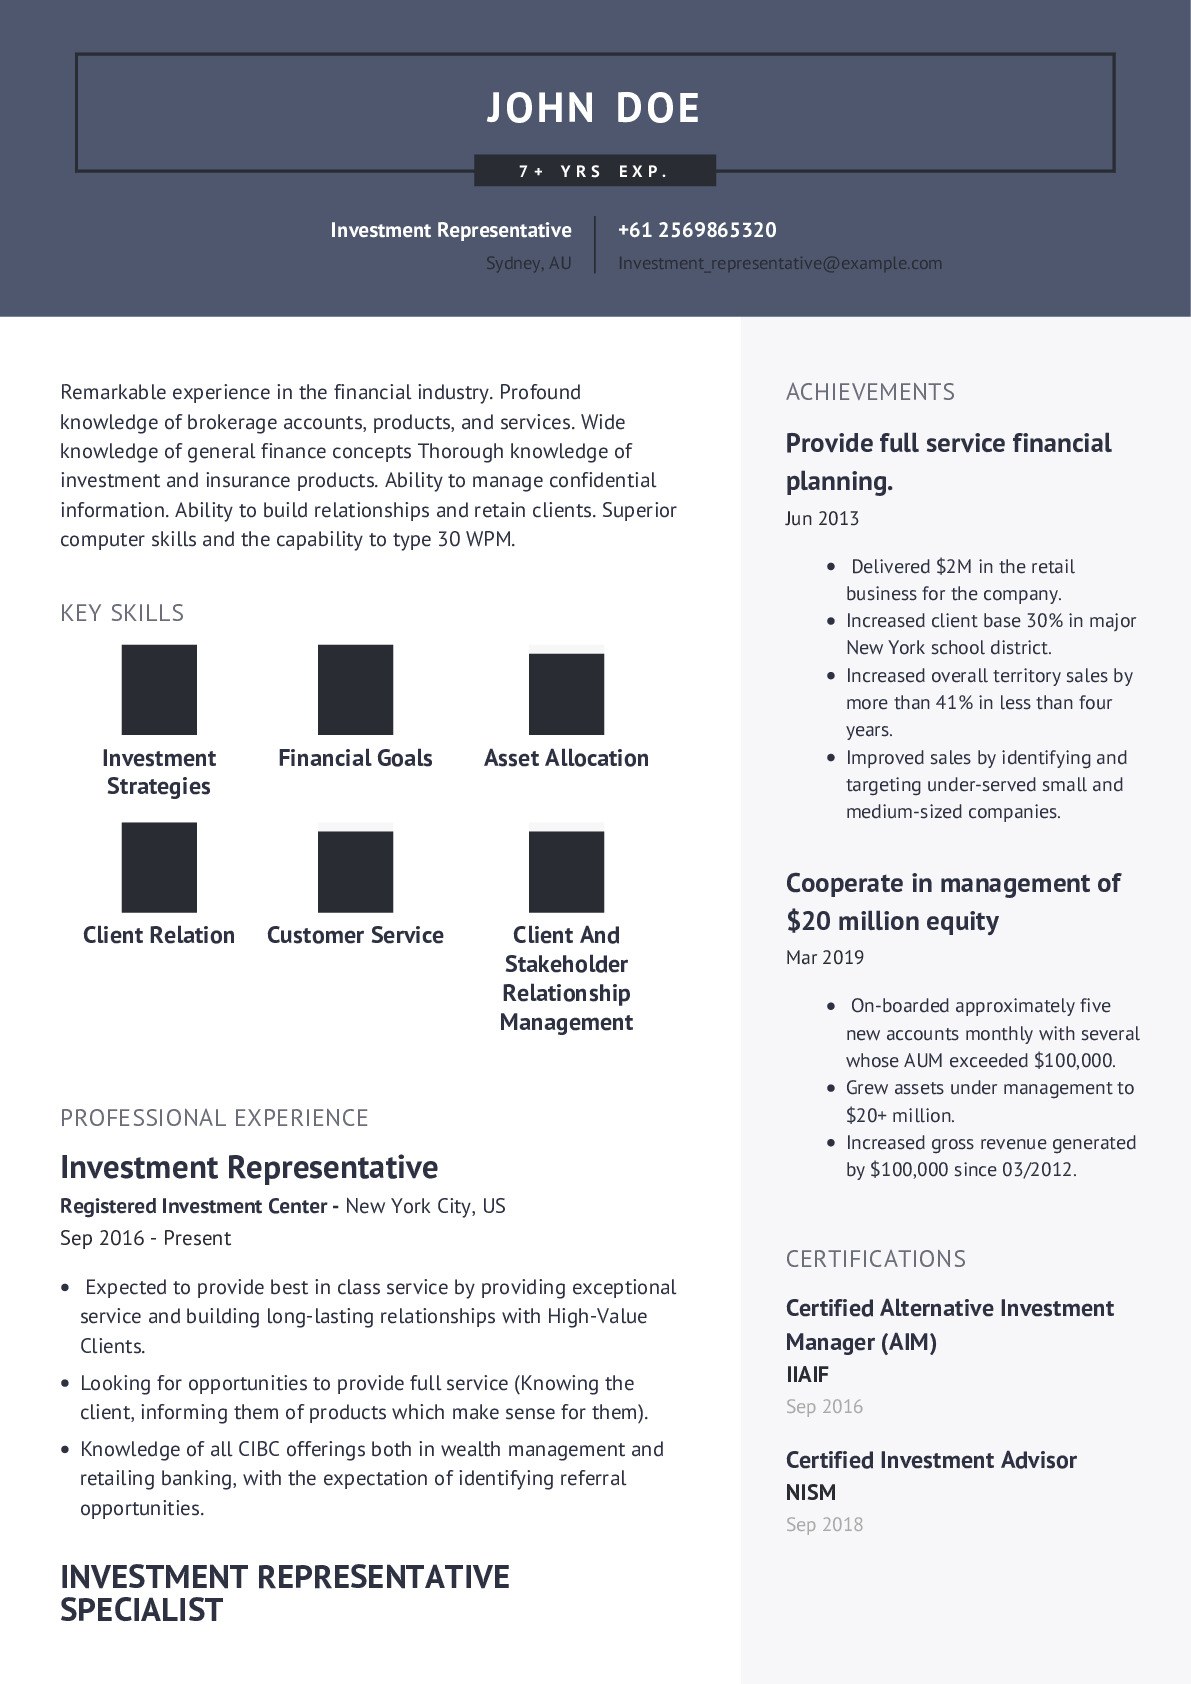 Investment Representative Resume Example